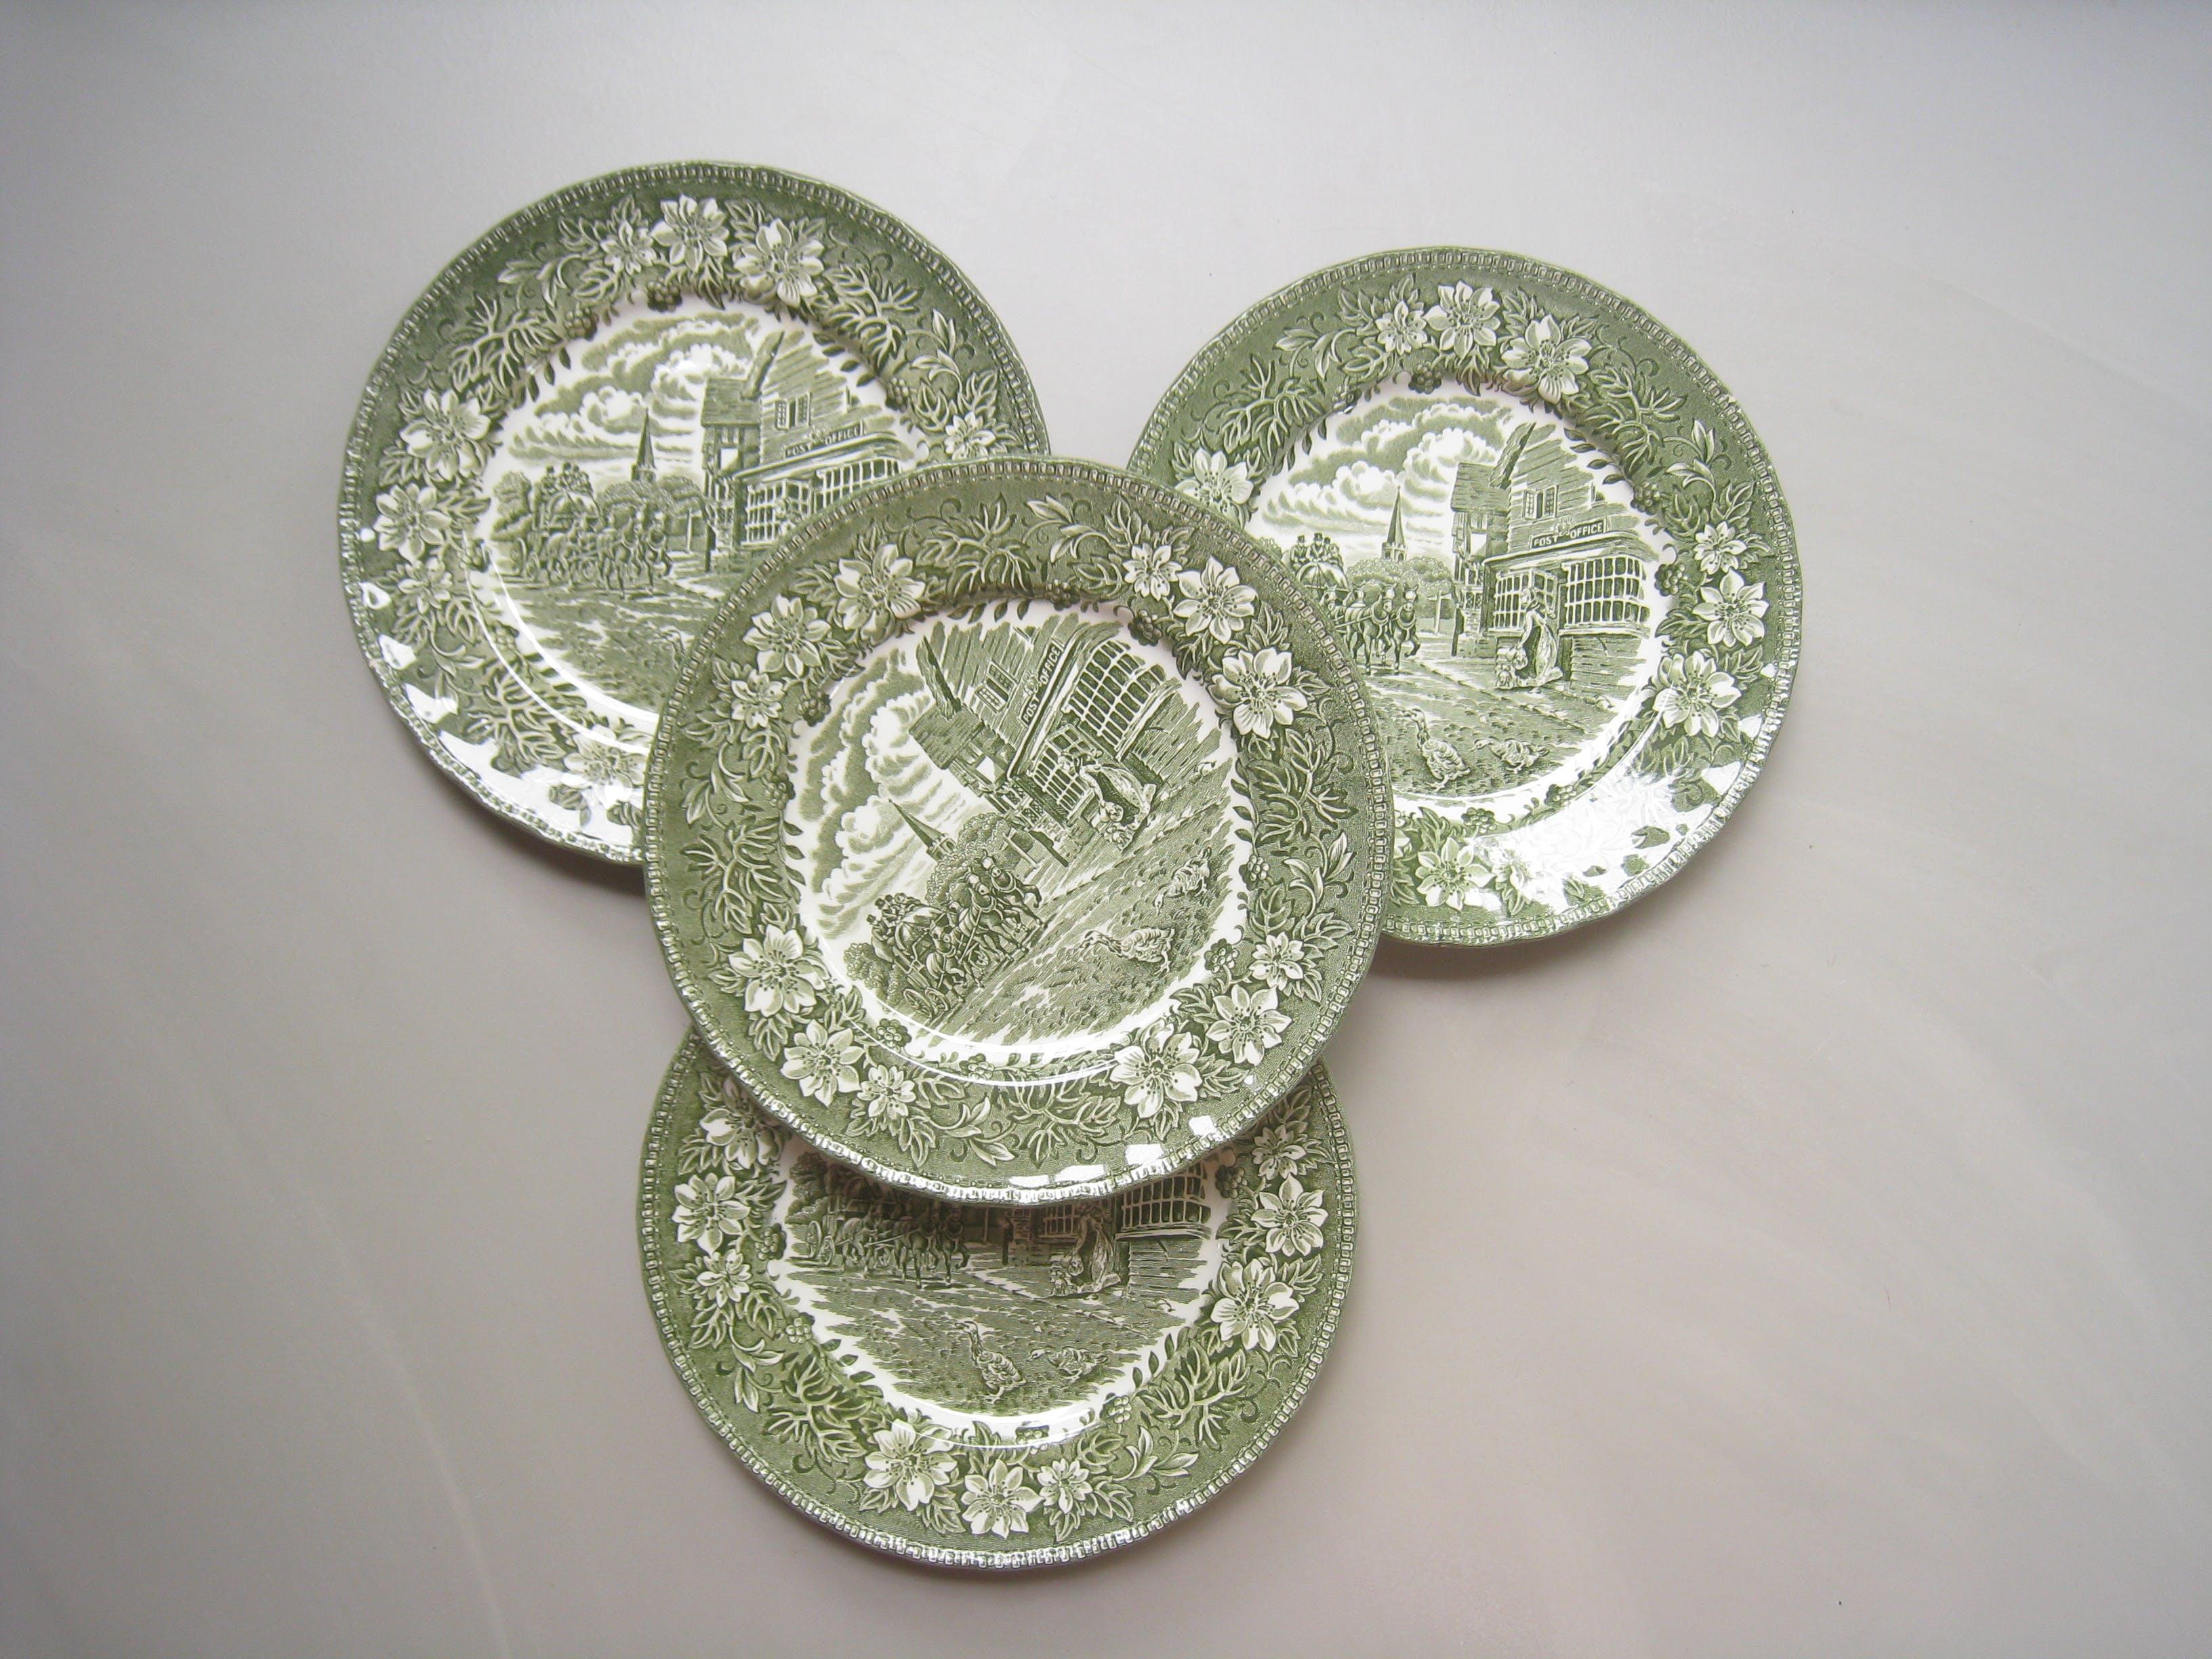 Ontbijtbordjes Royal Tudor Ware - groen